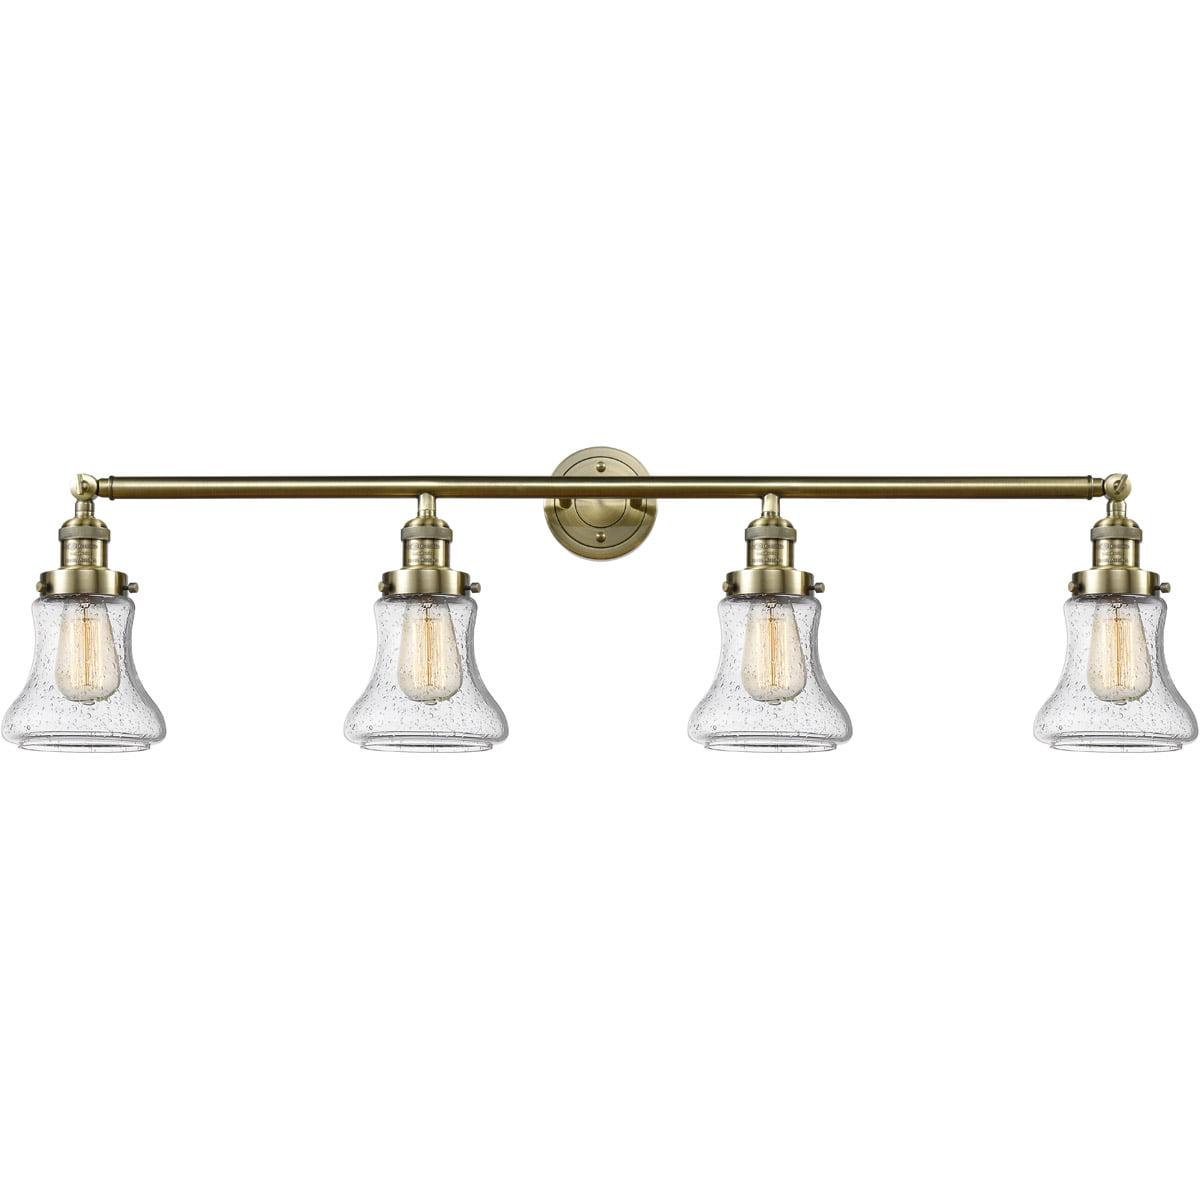 Bathroom Vanity 4 Light Fixtures With Antique Brass Finish ...